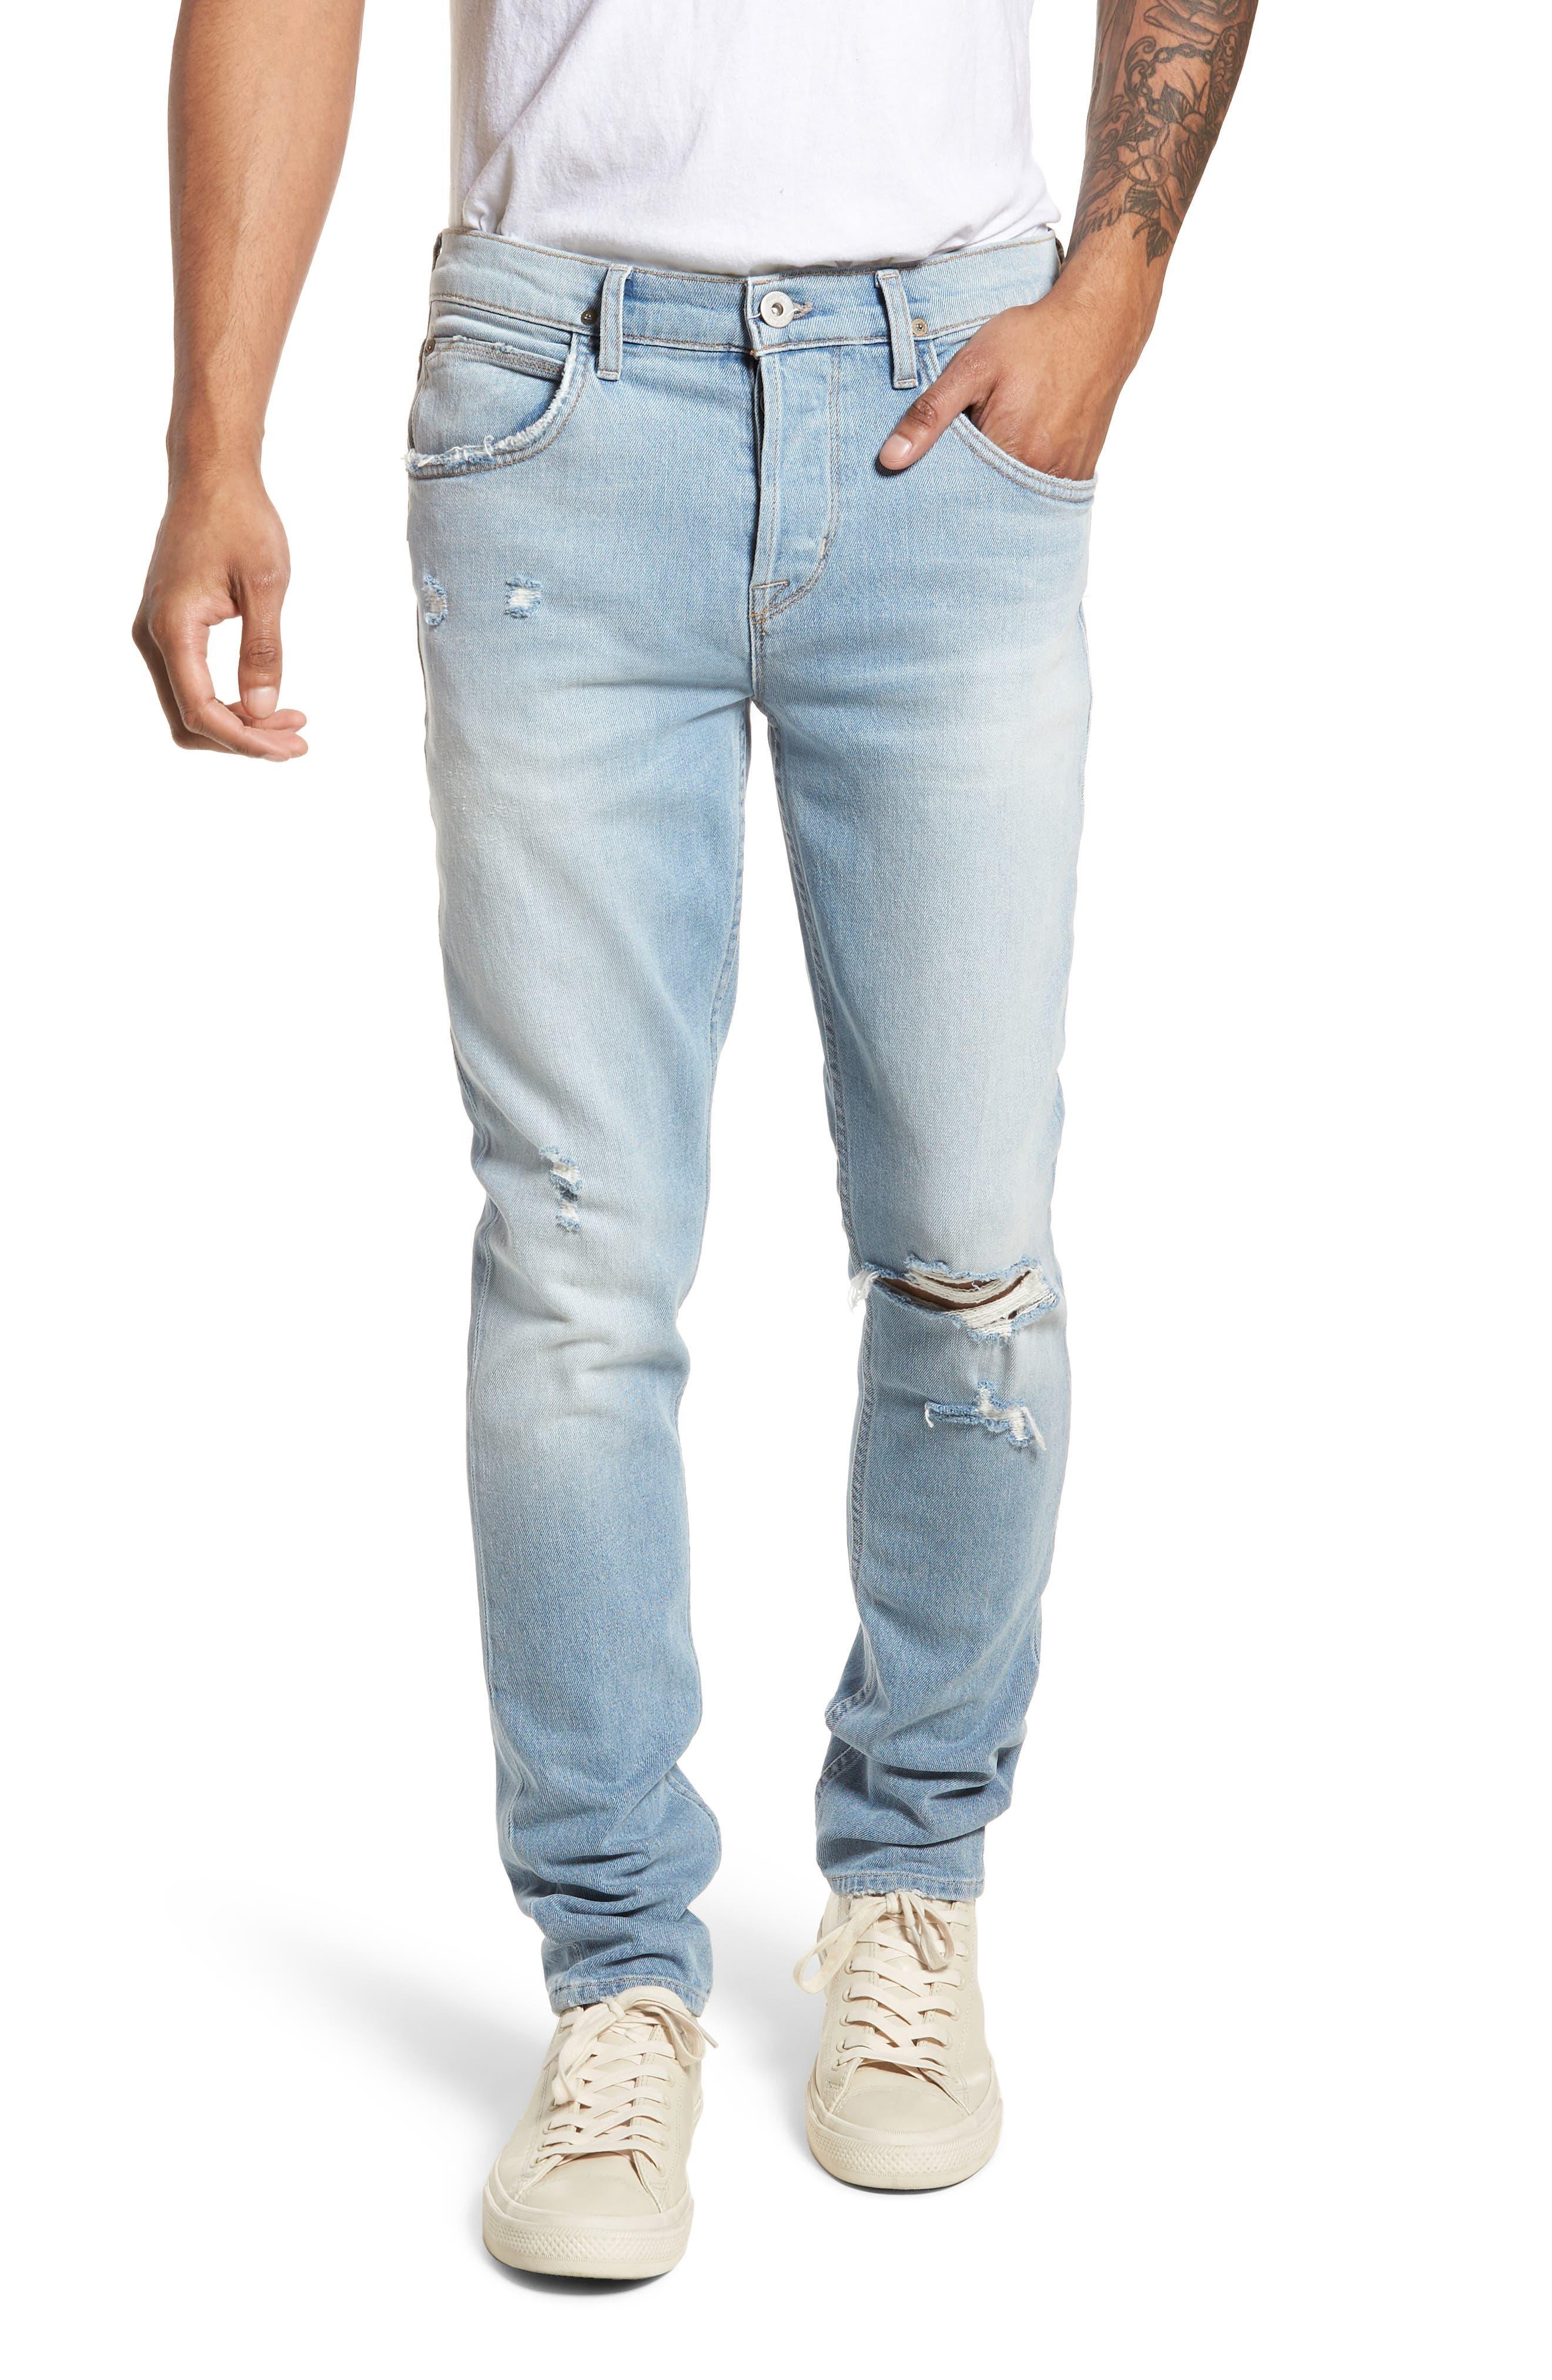 Axl Skinny Fit Jeans,                             Main thumbnail 1, color,                             BLAZE